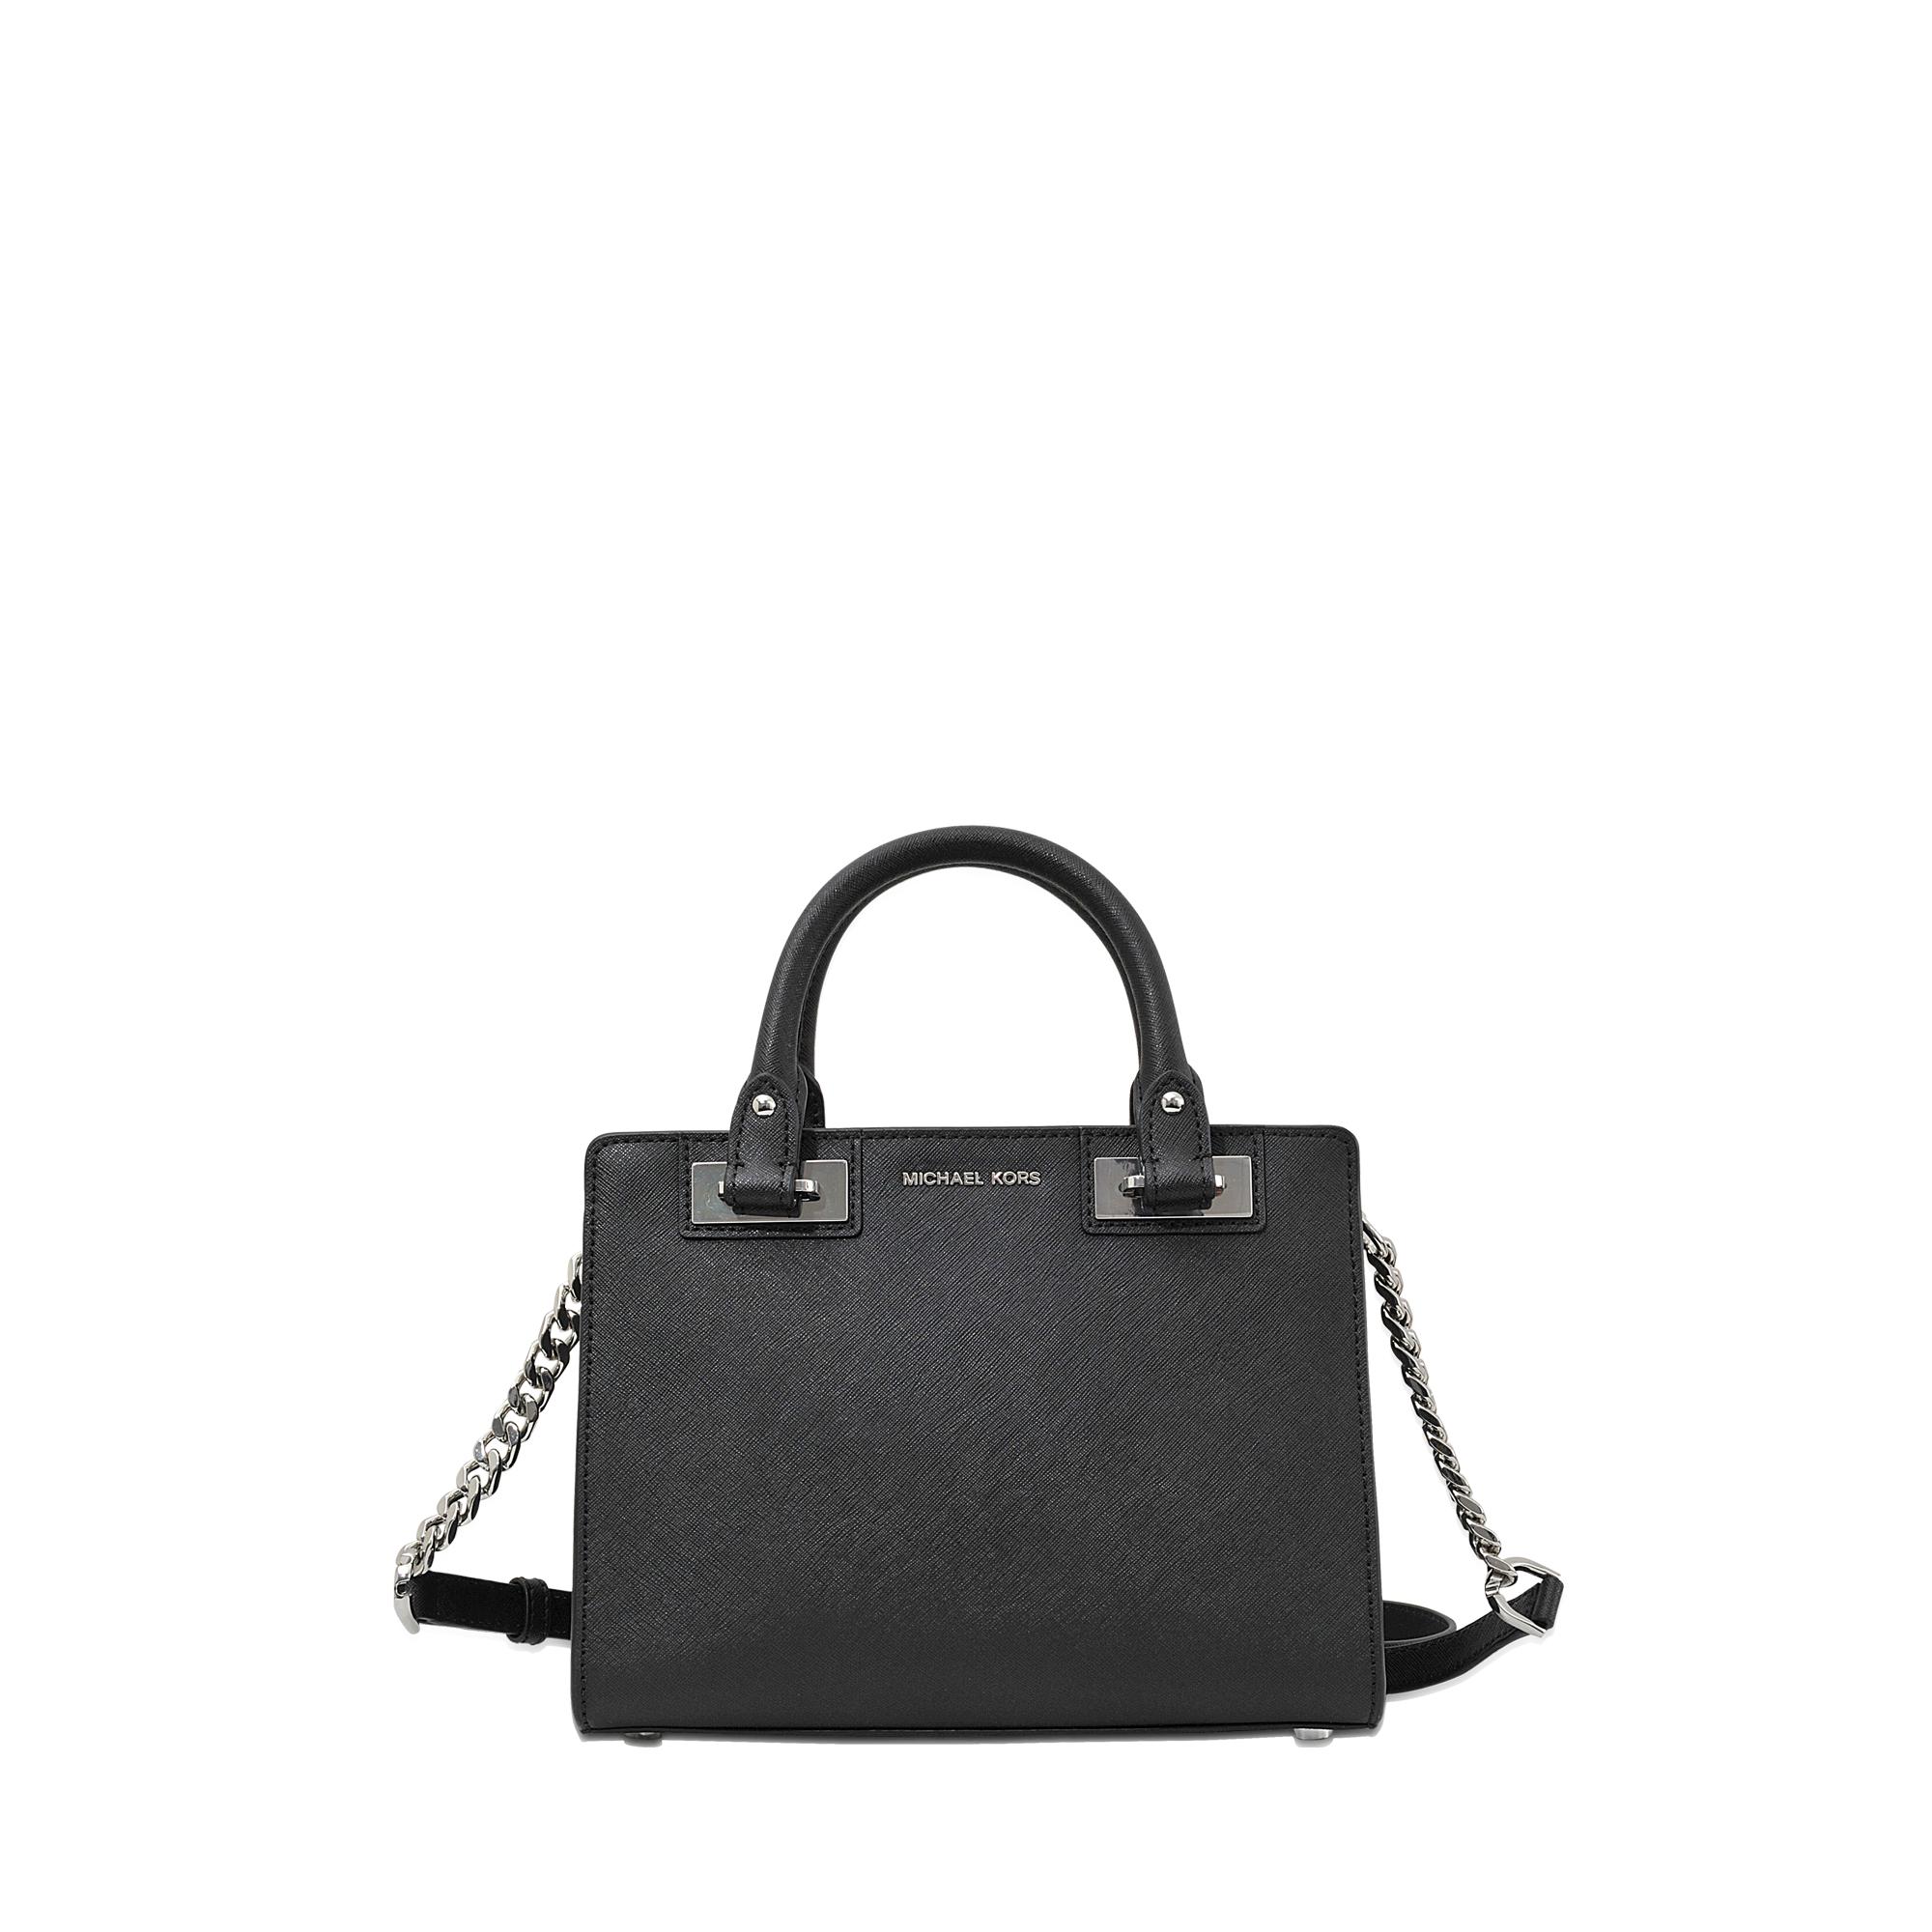 177a0c9eb8c0 ... inexpensive michael michael kors quinn small satchel in black lyst  d574f 76af7